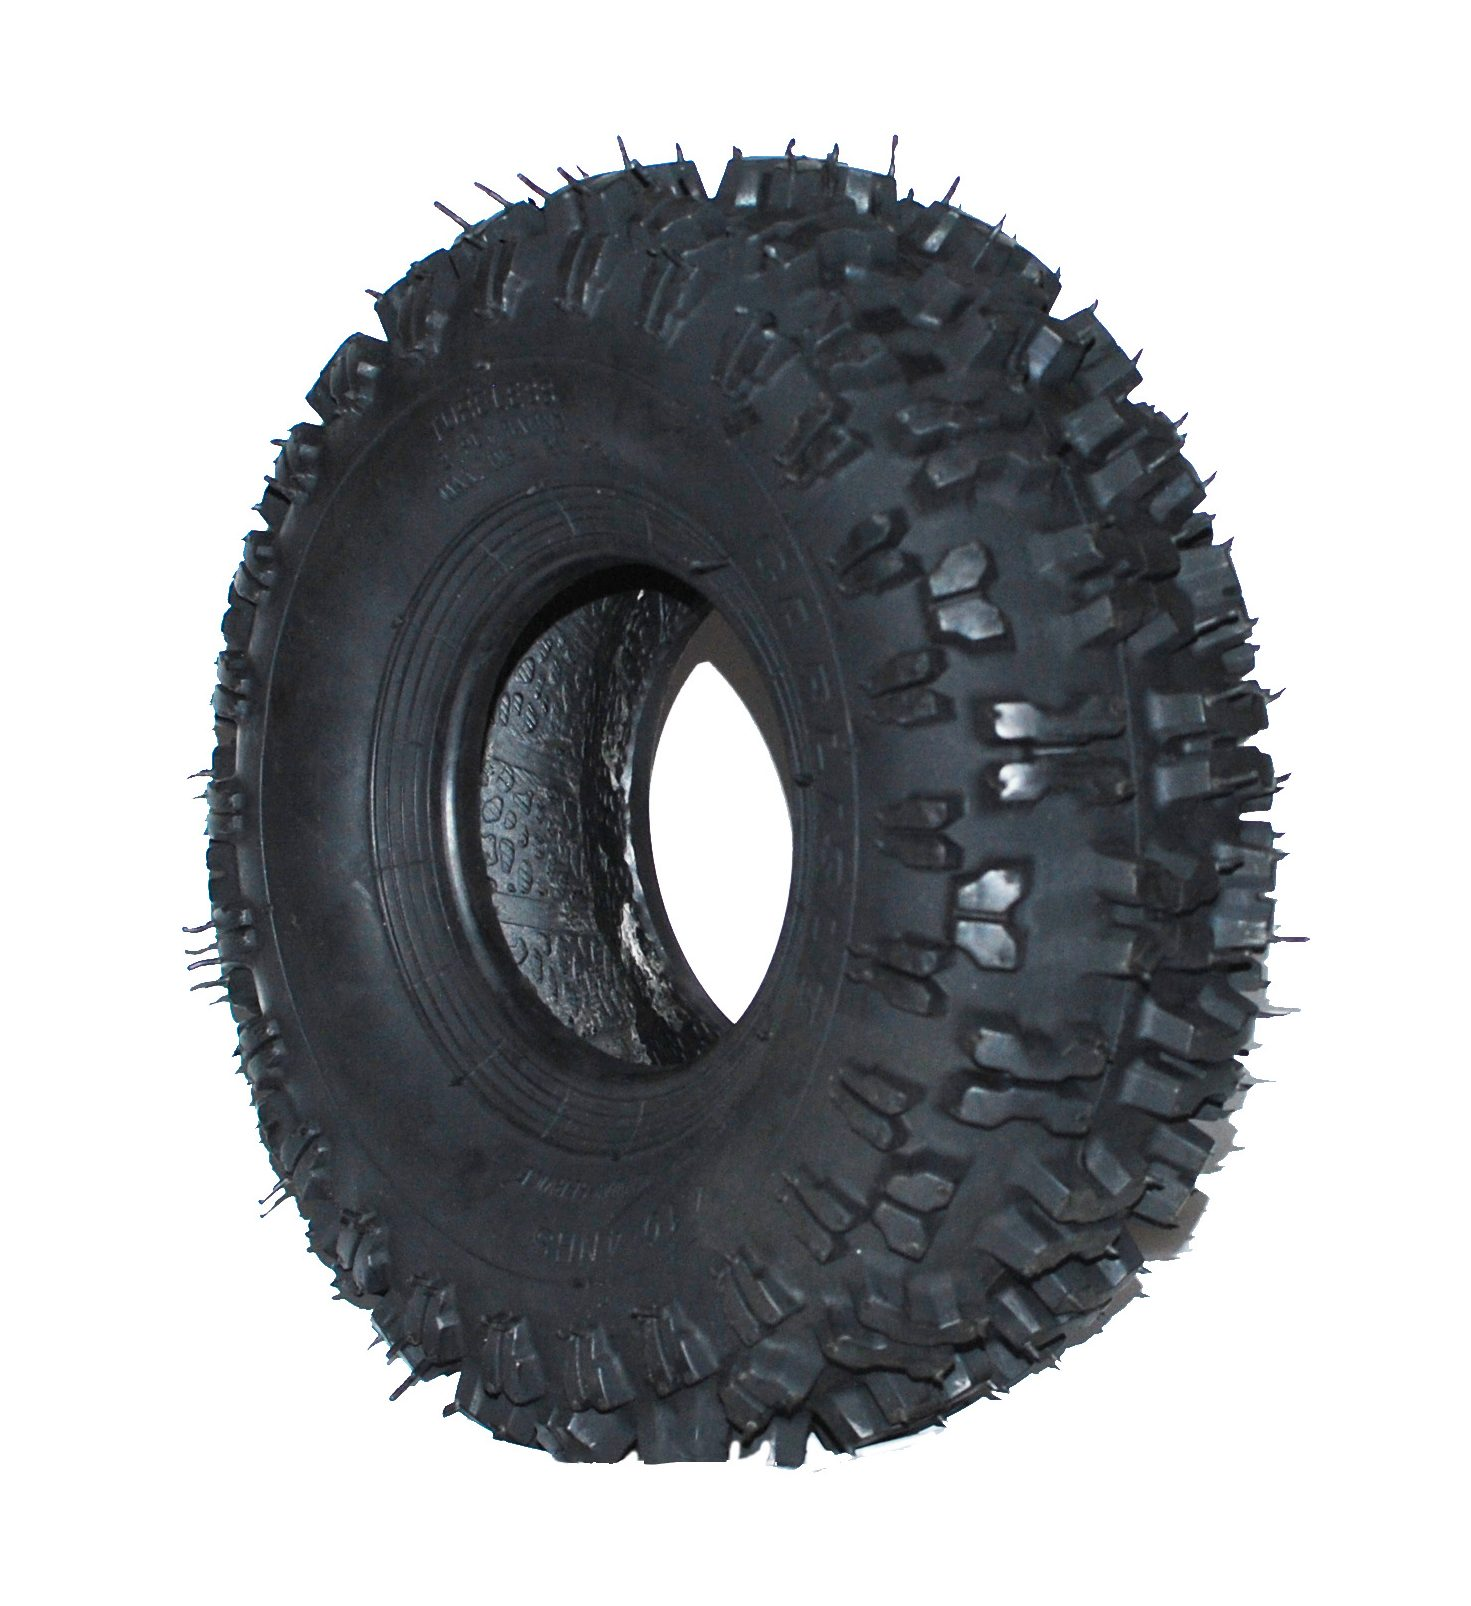 Tires, Tubes & Rims